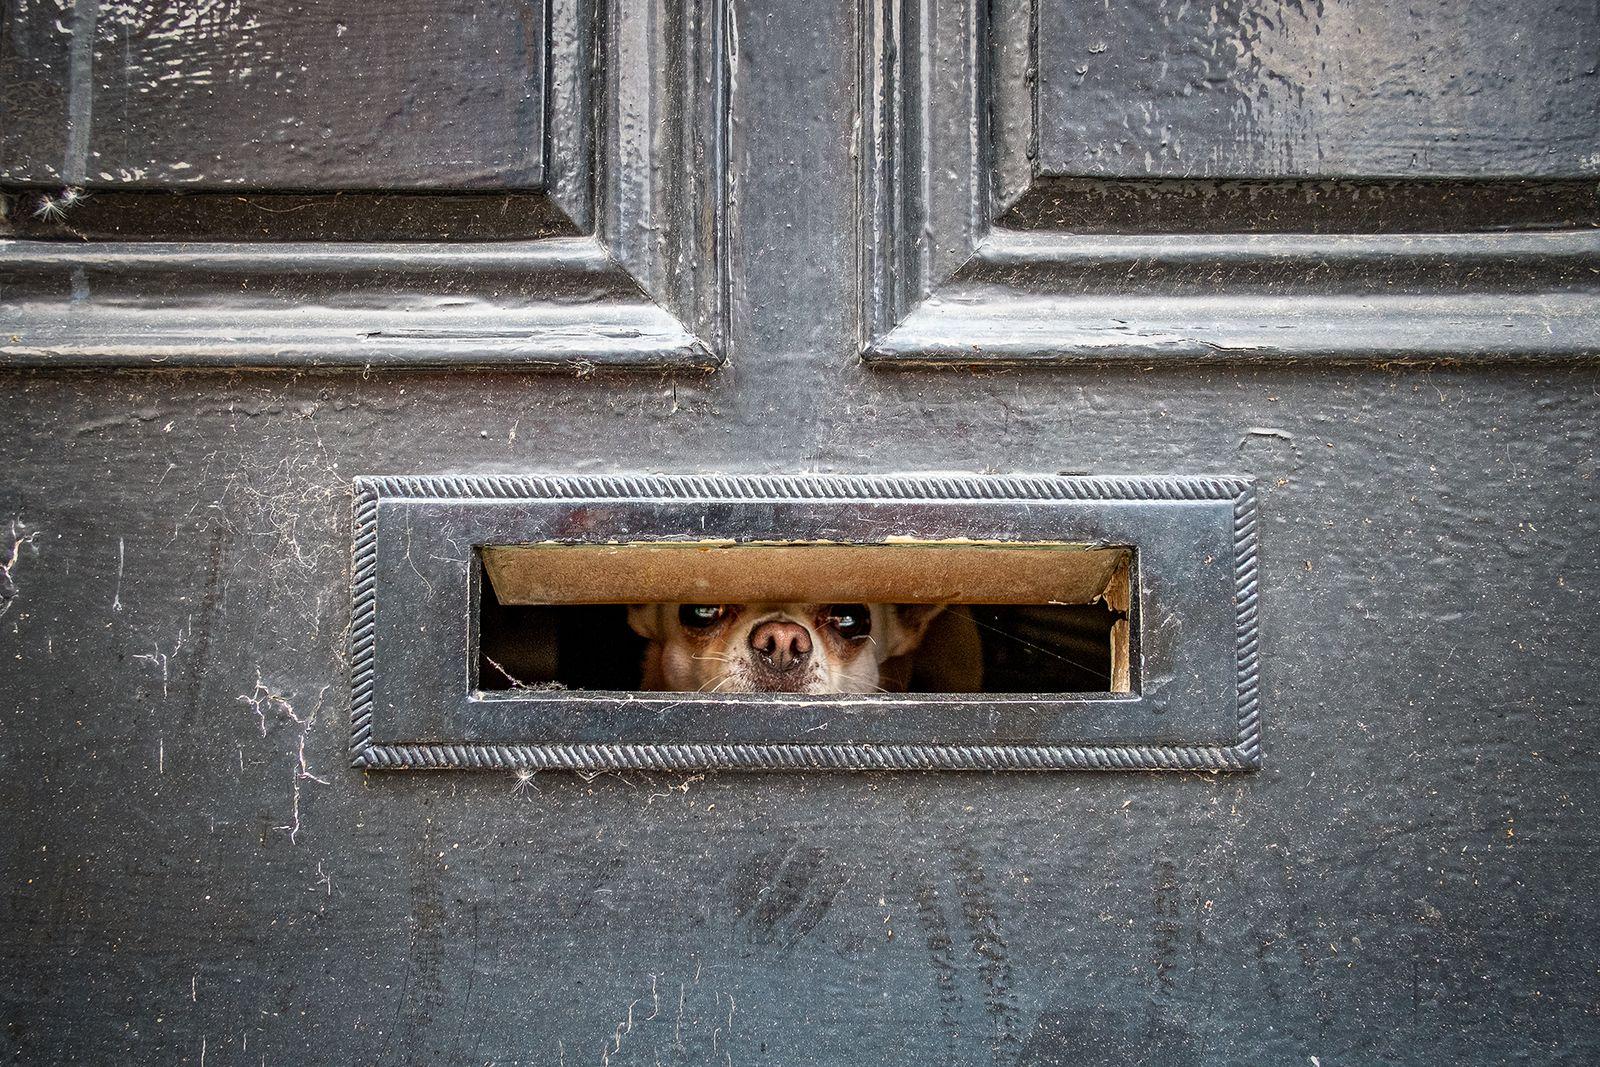 When the postman calls